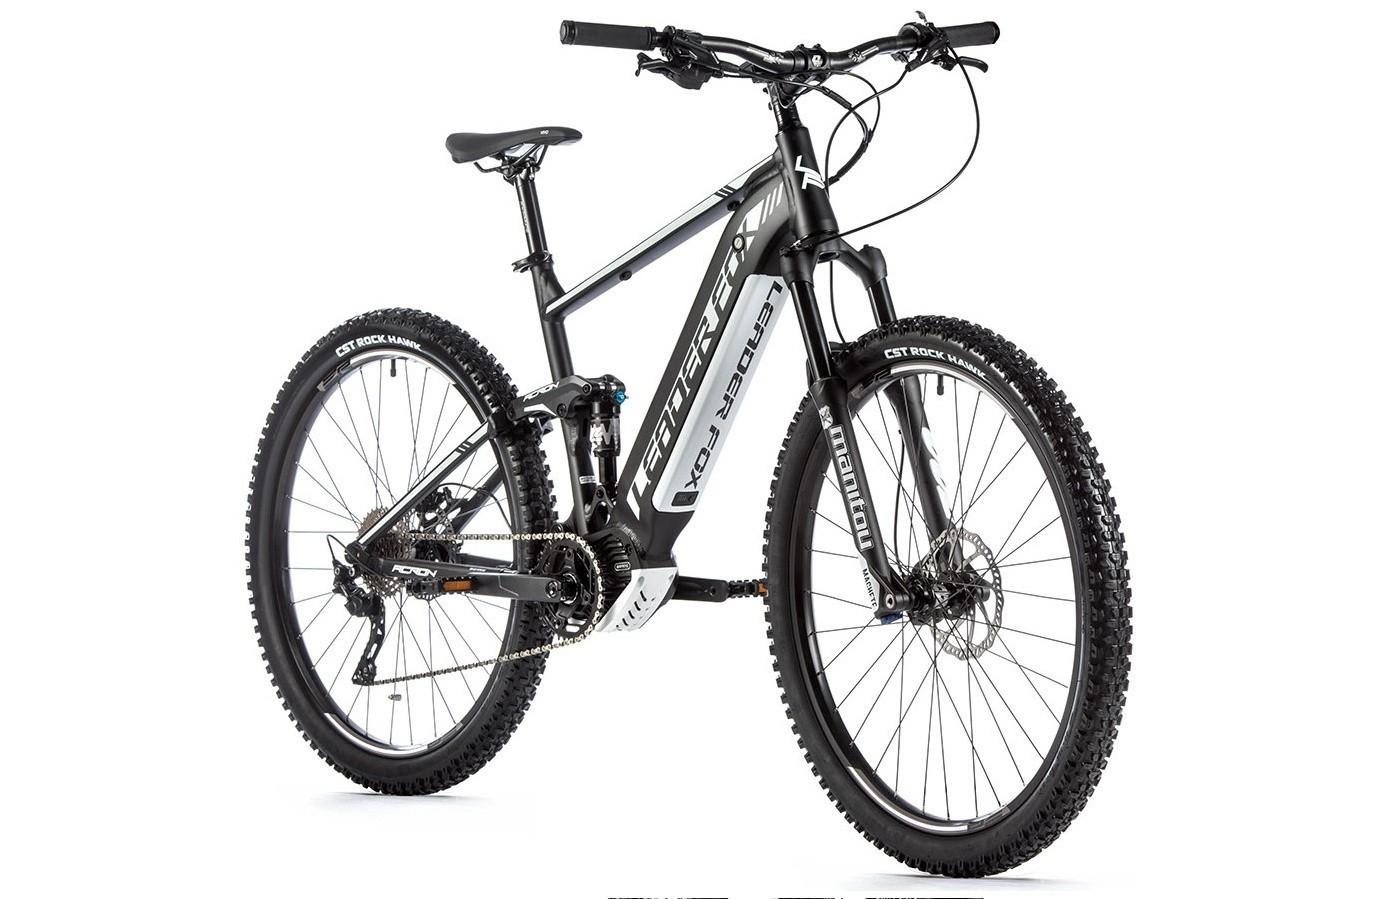 Full suspension E-Bike Acron MTB 29